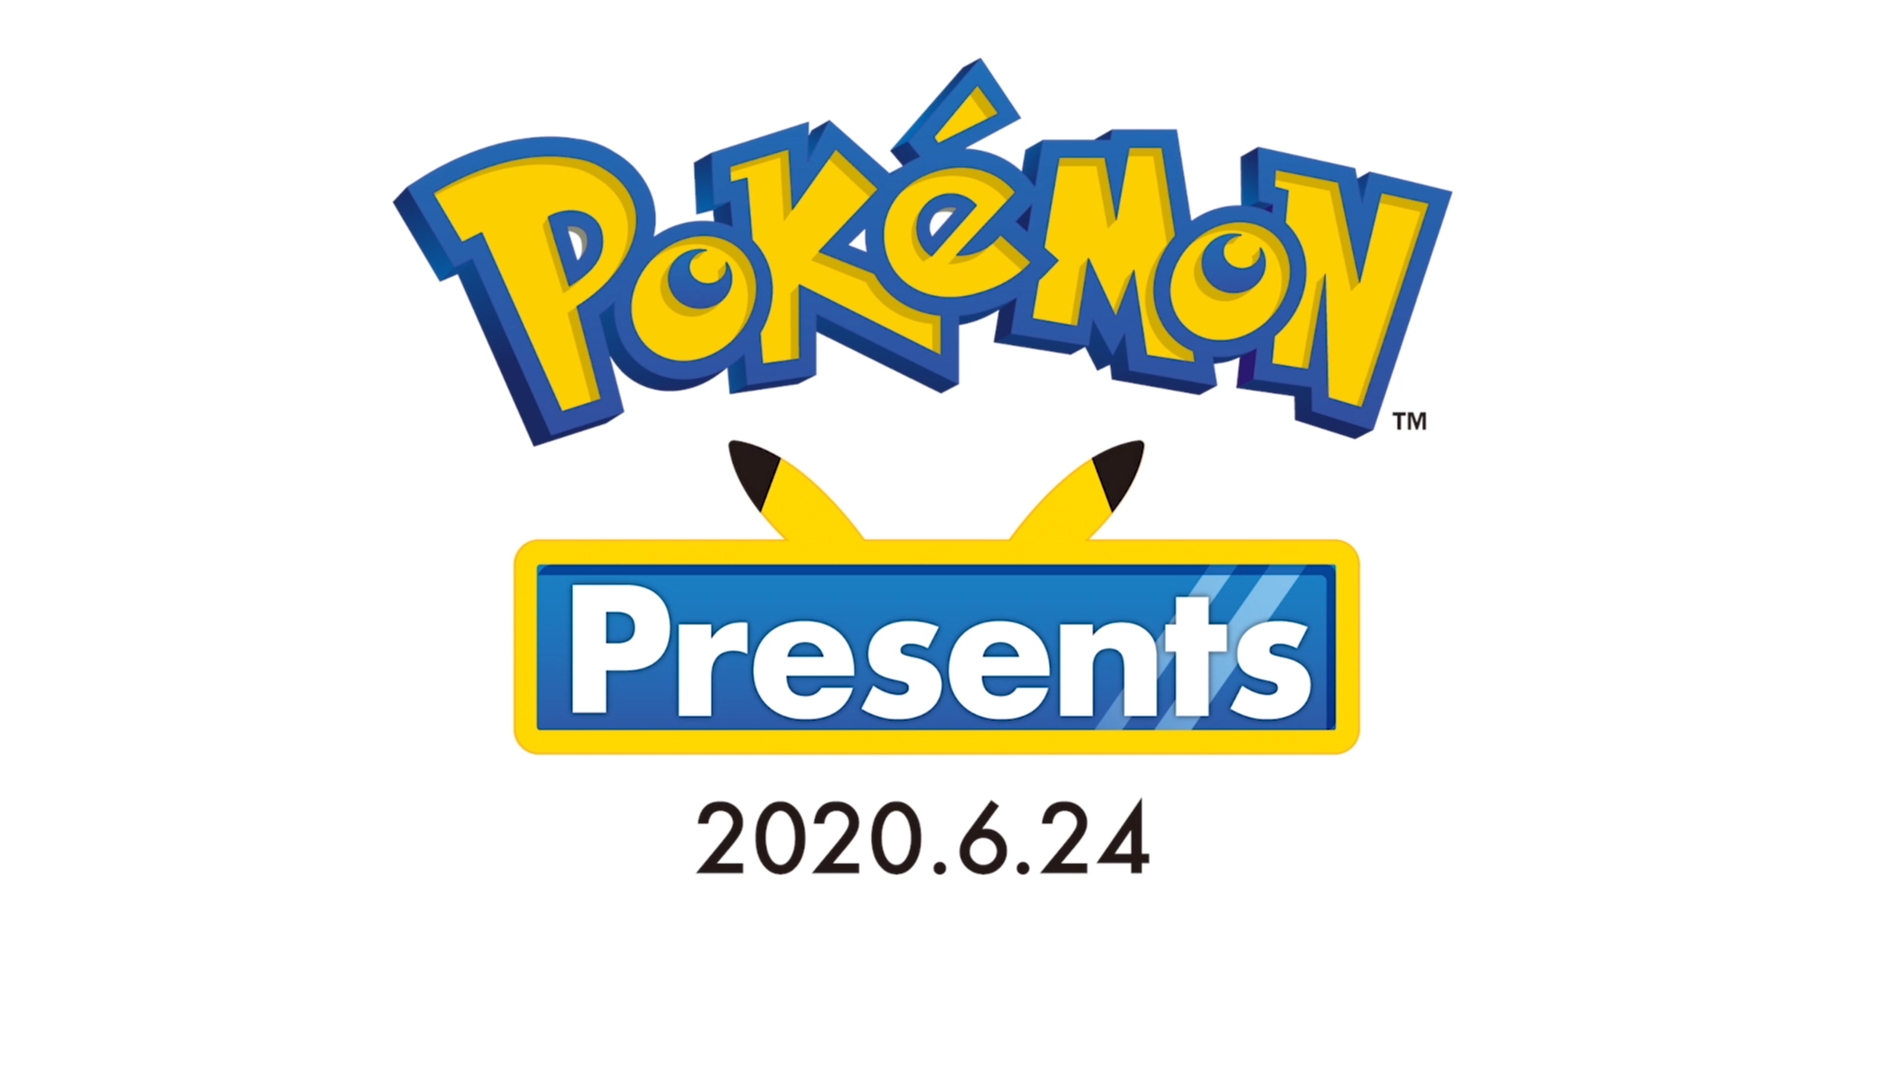 Pokémon Presents annunciato ufficialmente! Ecco data e orario